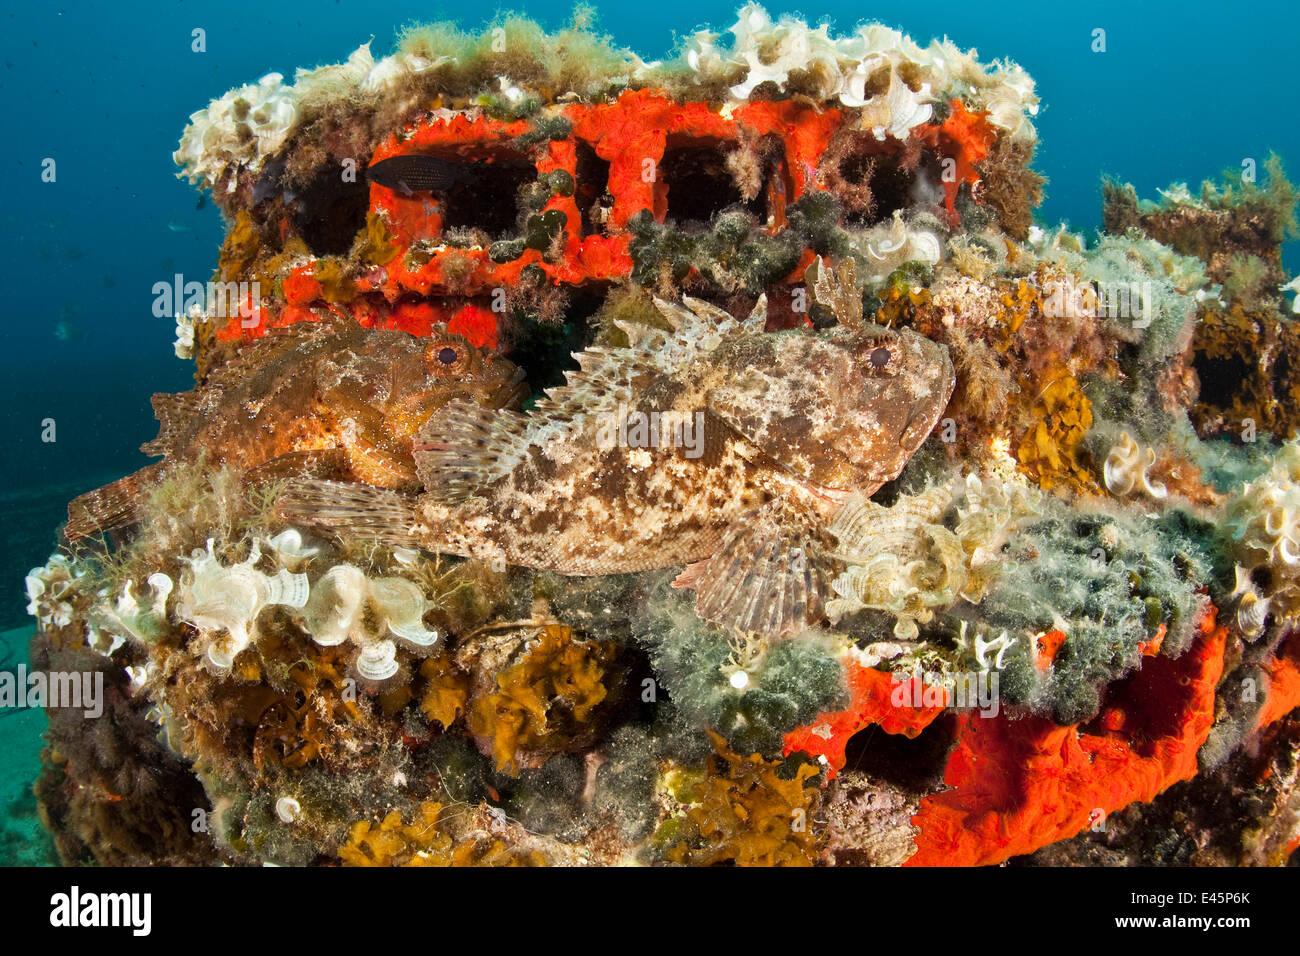 Two Scorpionfish (Scorpaena porcus) lying on artificial reef, Larvotto Marine Reserve, Monaco, Mediterranean Sea, - Stock Image